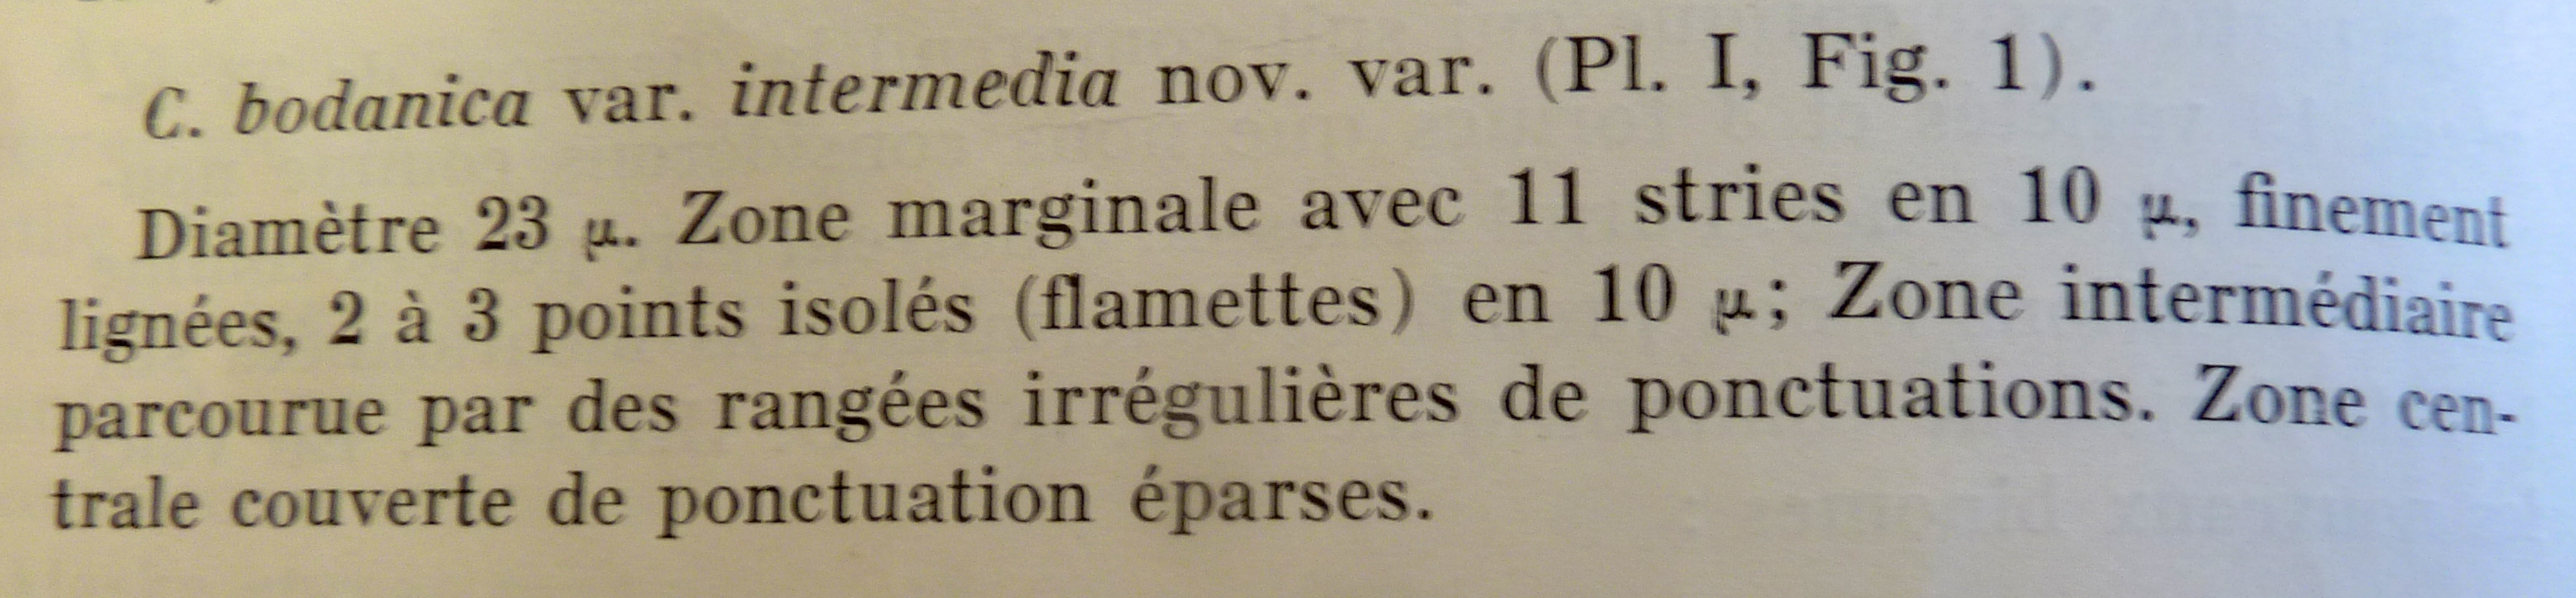 Cyclotella bodanica var. Intermedia orig desc